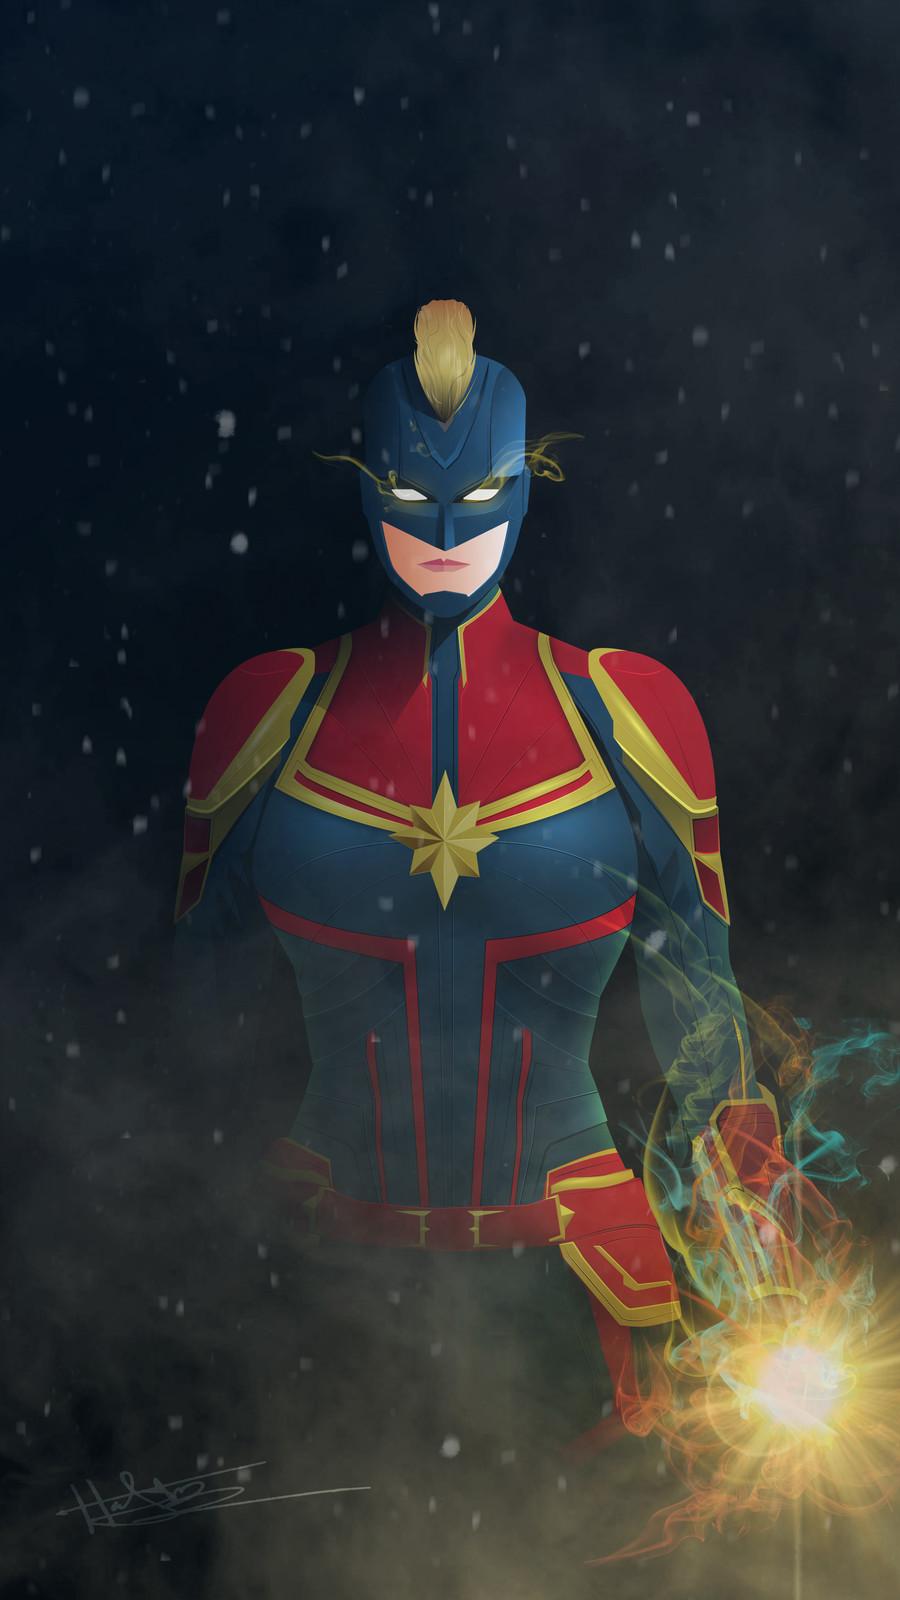 Captain mavel